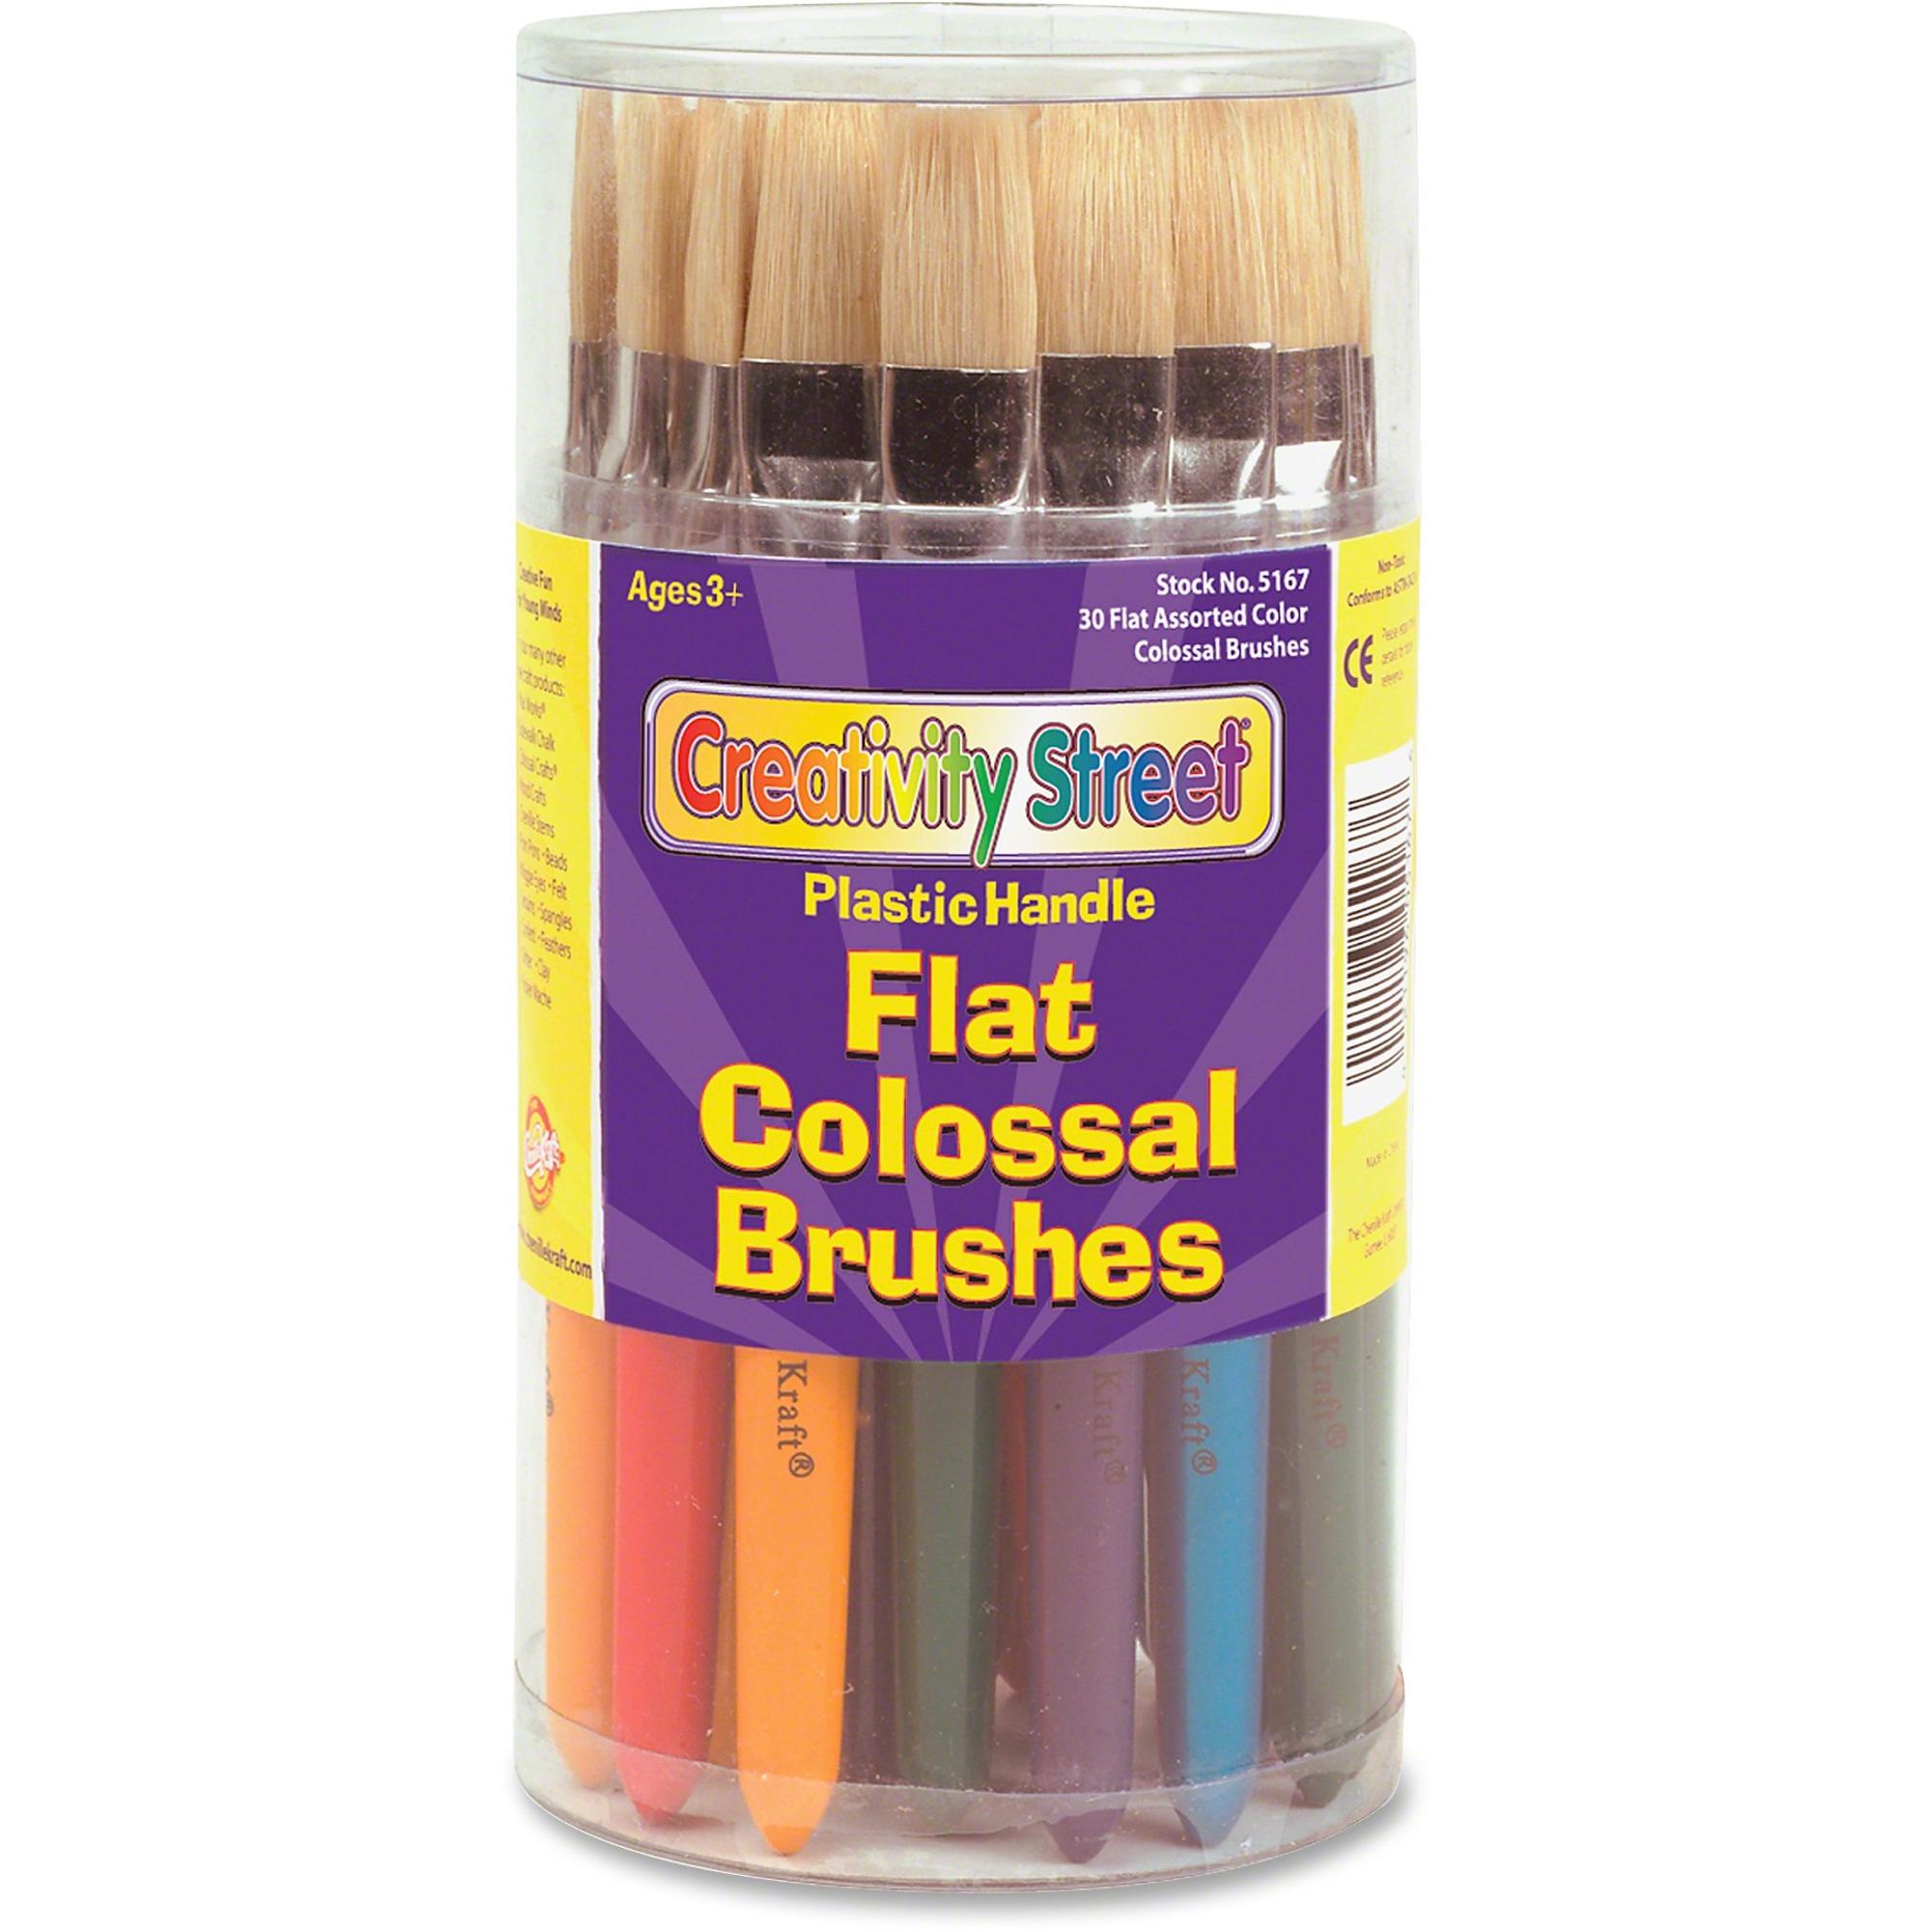 Creativity Street Flat Colossal Brushes